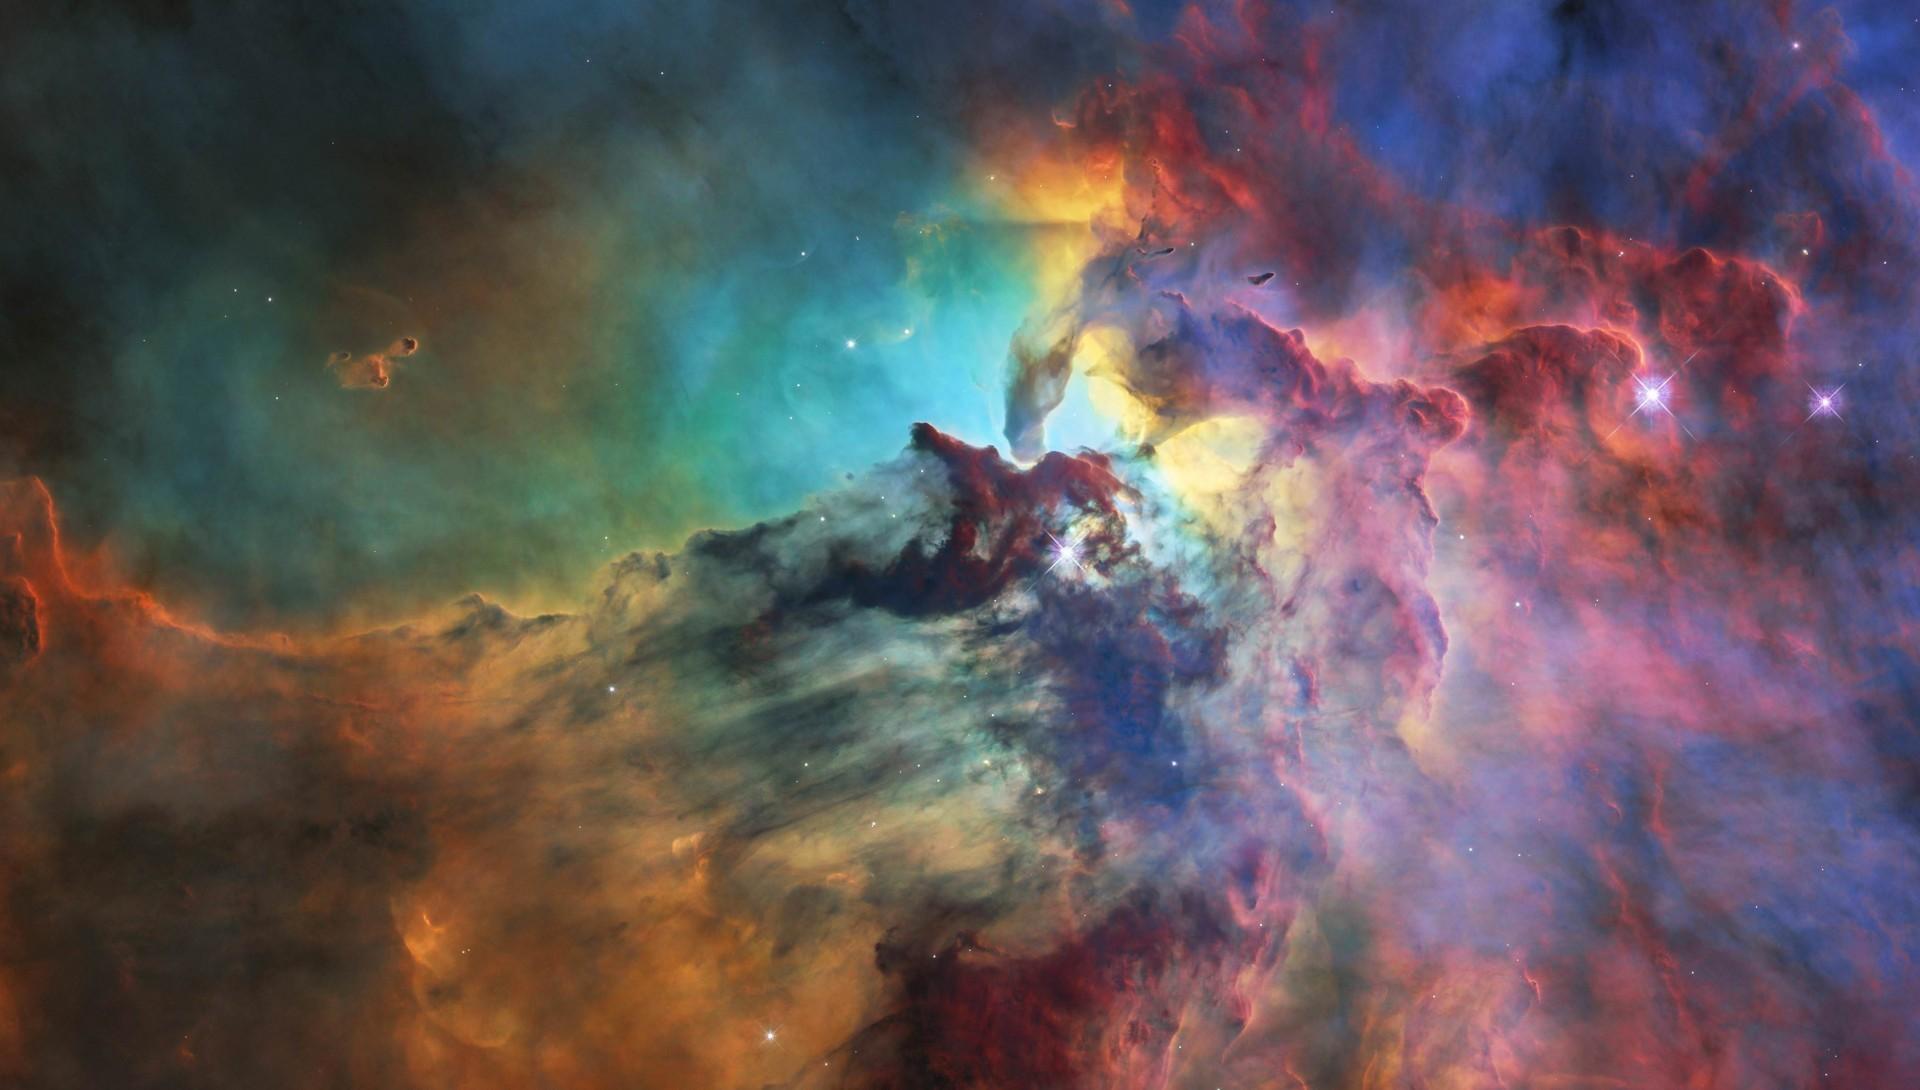 Lagoon Nebula Colorful Galaxy 1920x1090 Download Hd Wallpaper Wallpapertip